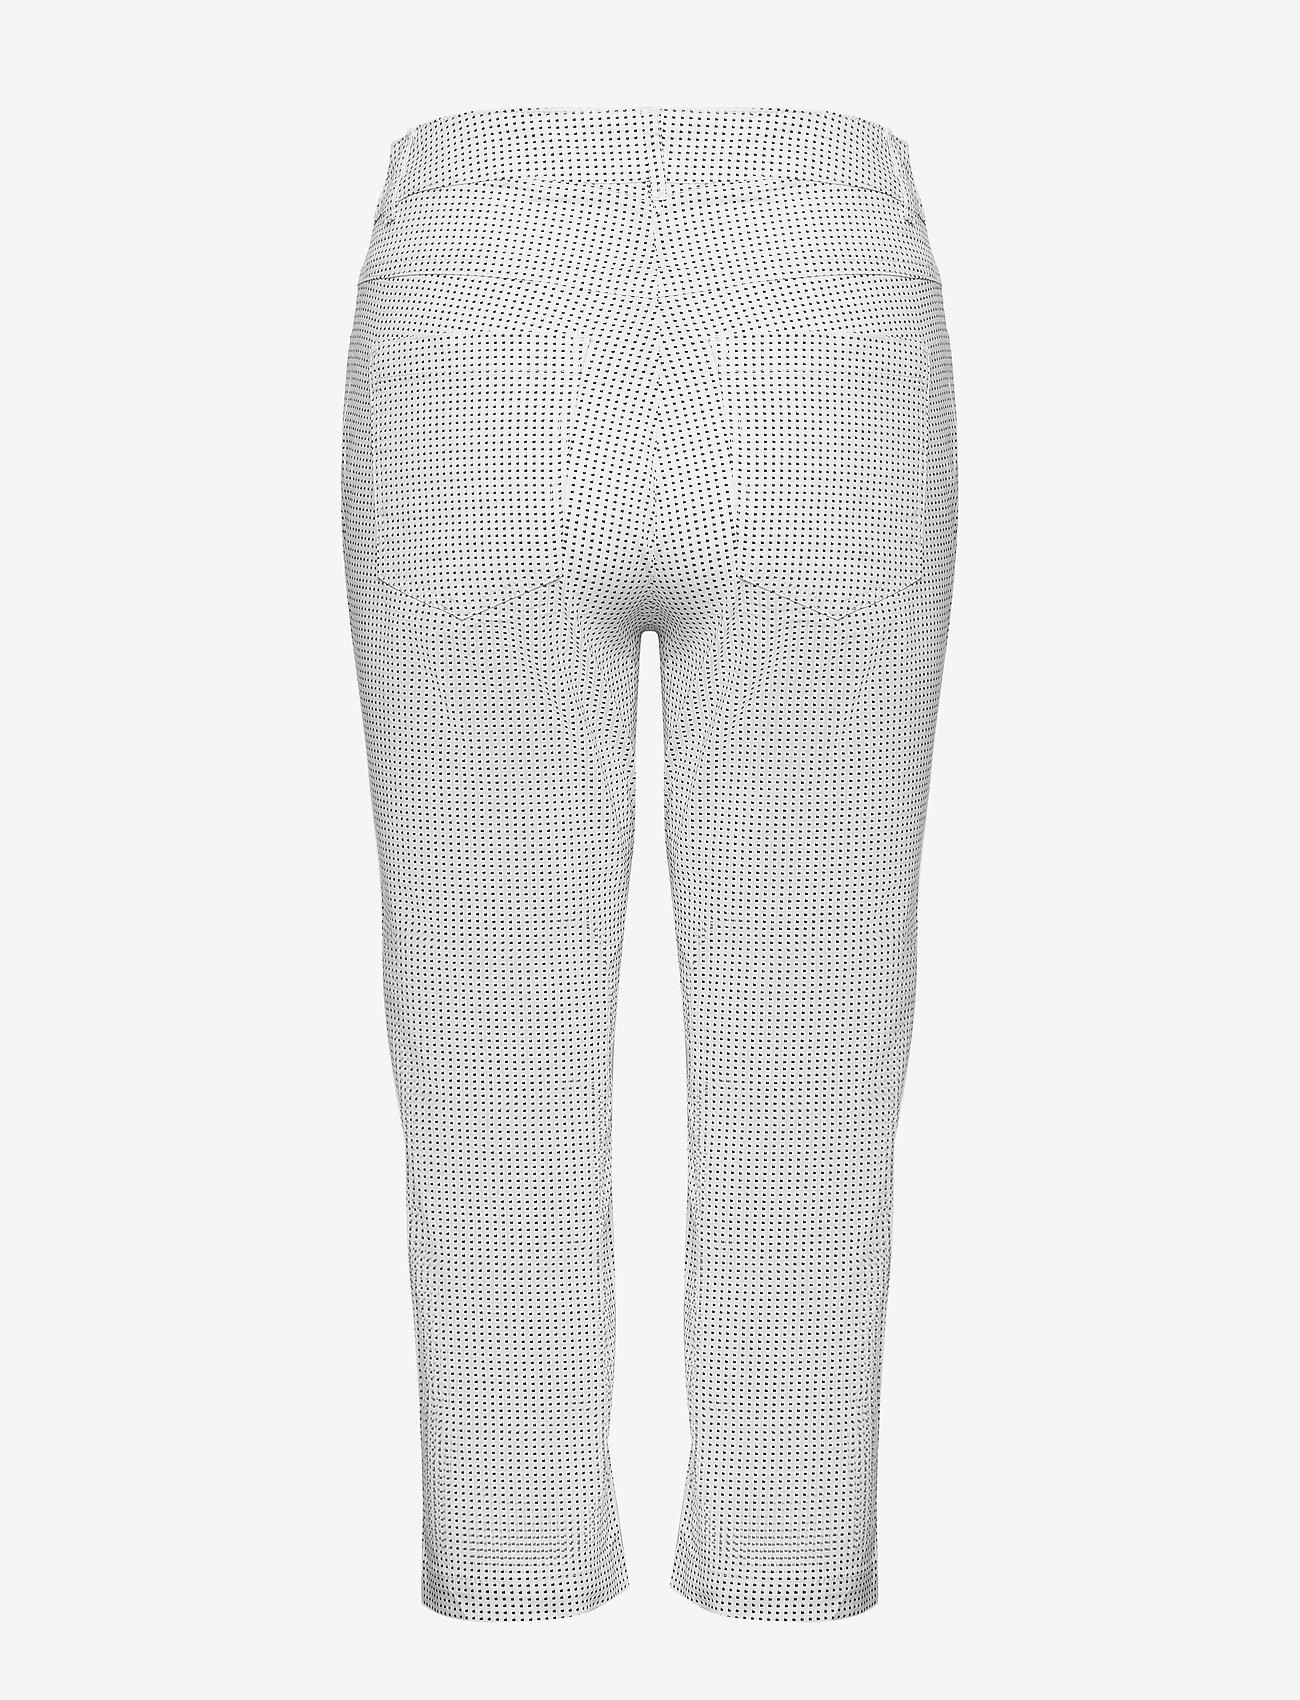 Brandtex Capri Pants - Byxor White